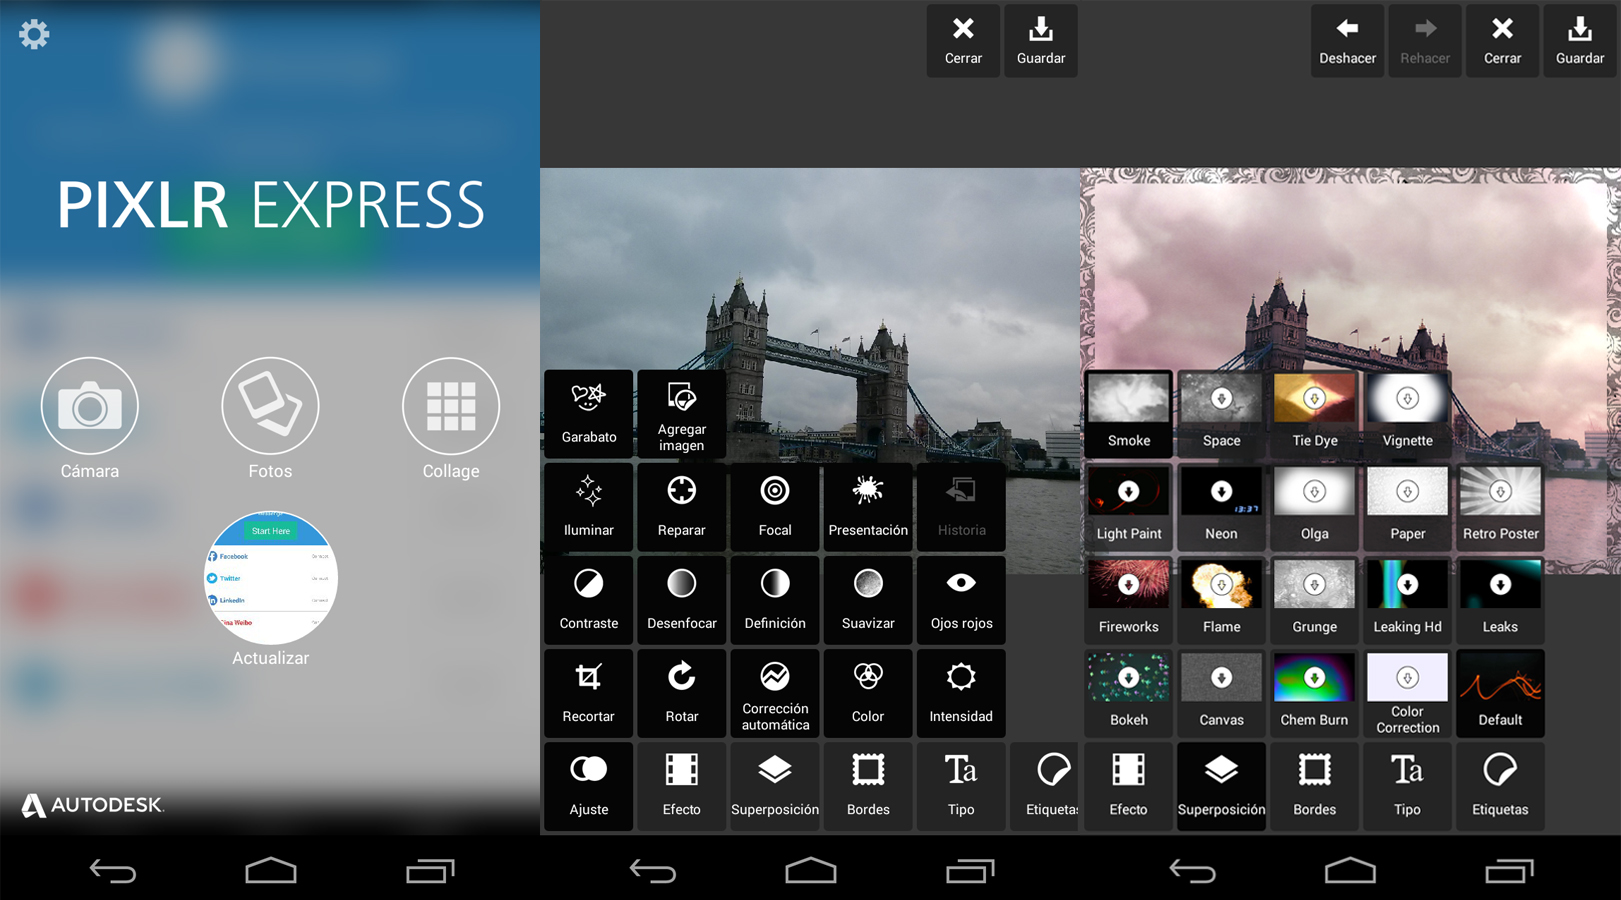 Autodesk Pixlr - Screen